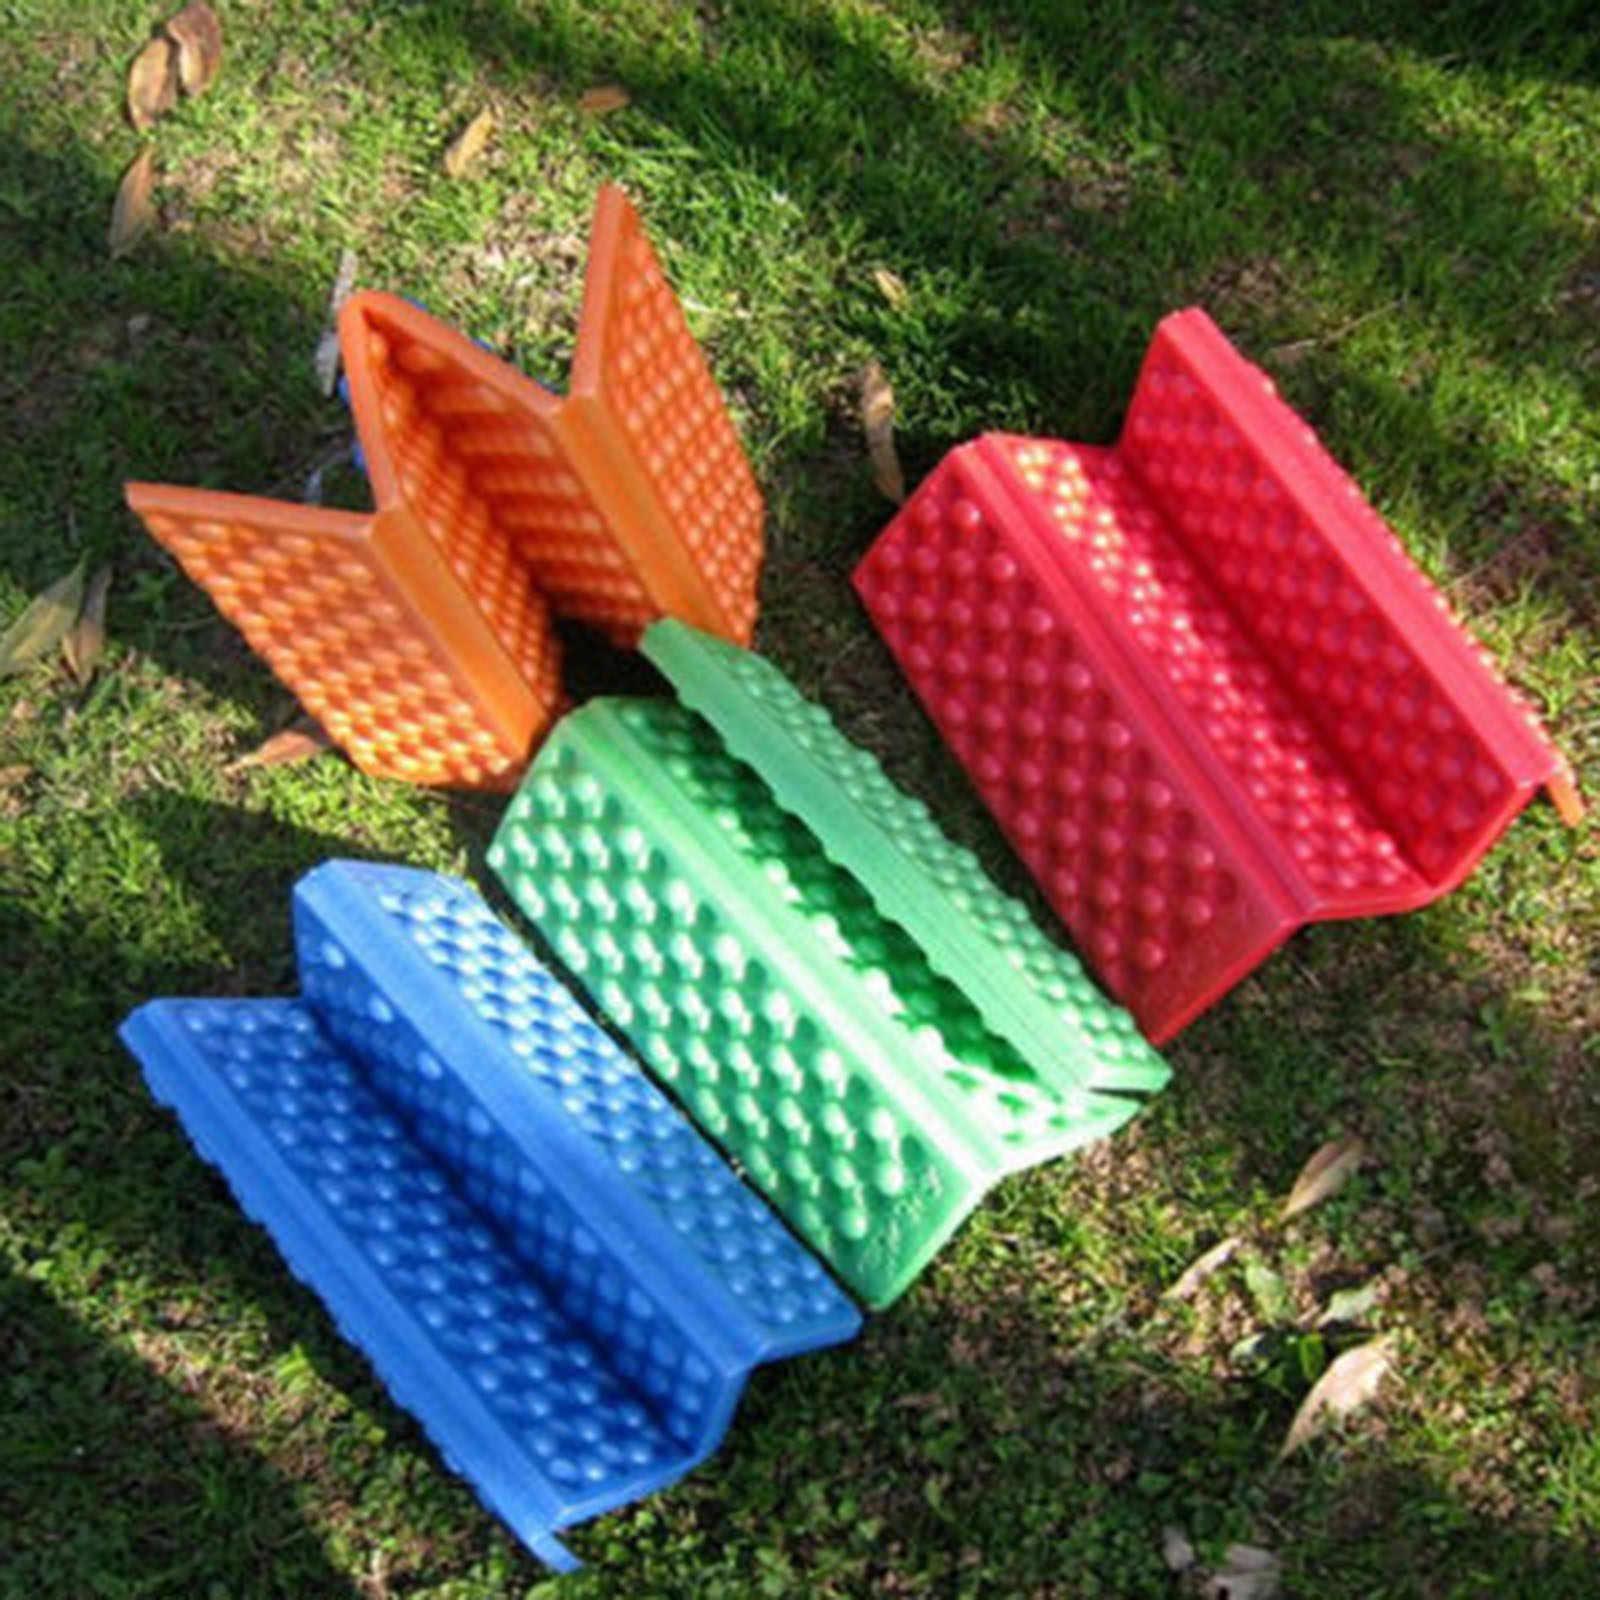 Opvouwbaar Opvouwbare Outdoor Camping Mat EVA Waterdichte Seat Foam Pad Stoel Picknick vochtbestendige Matras Strand Pad Camping Tool